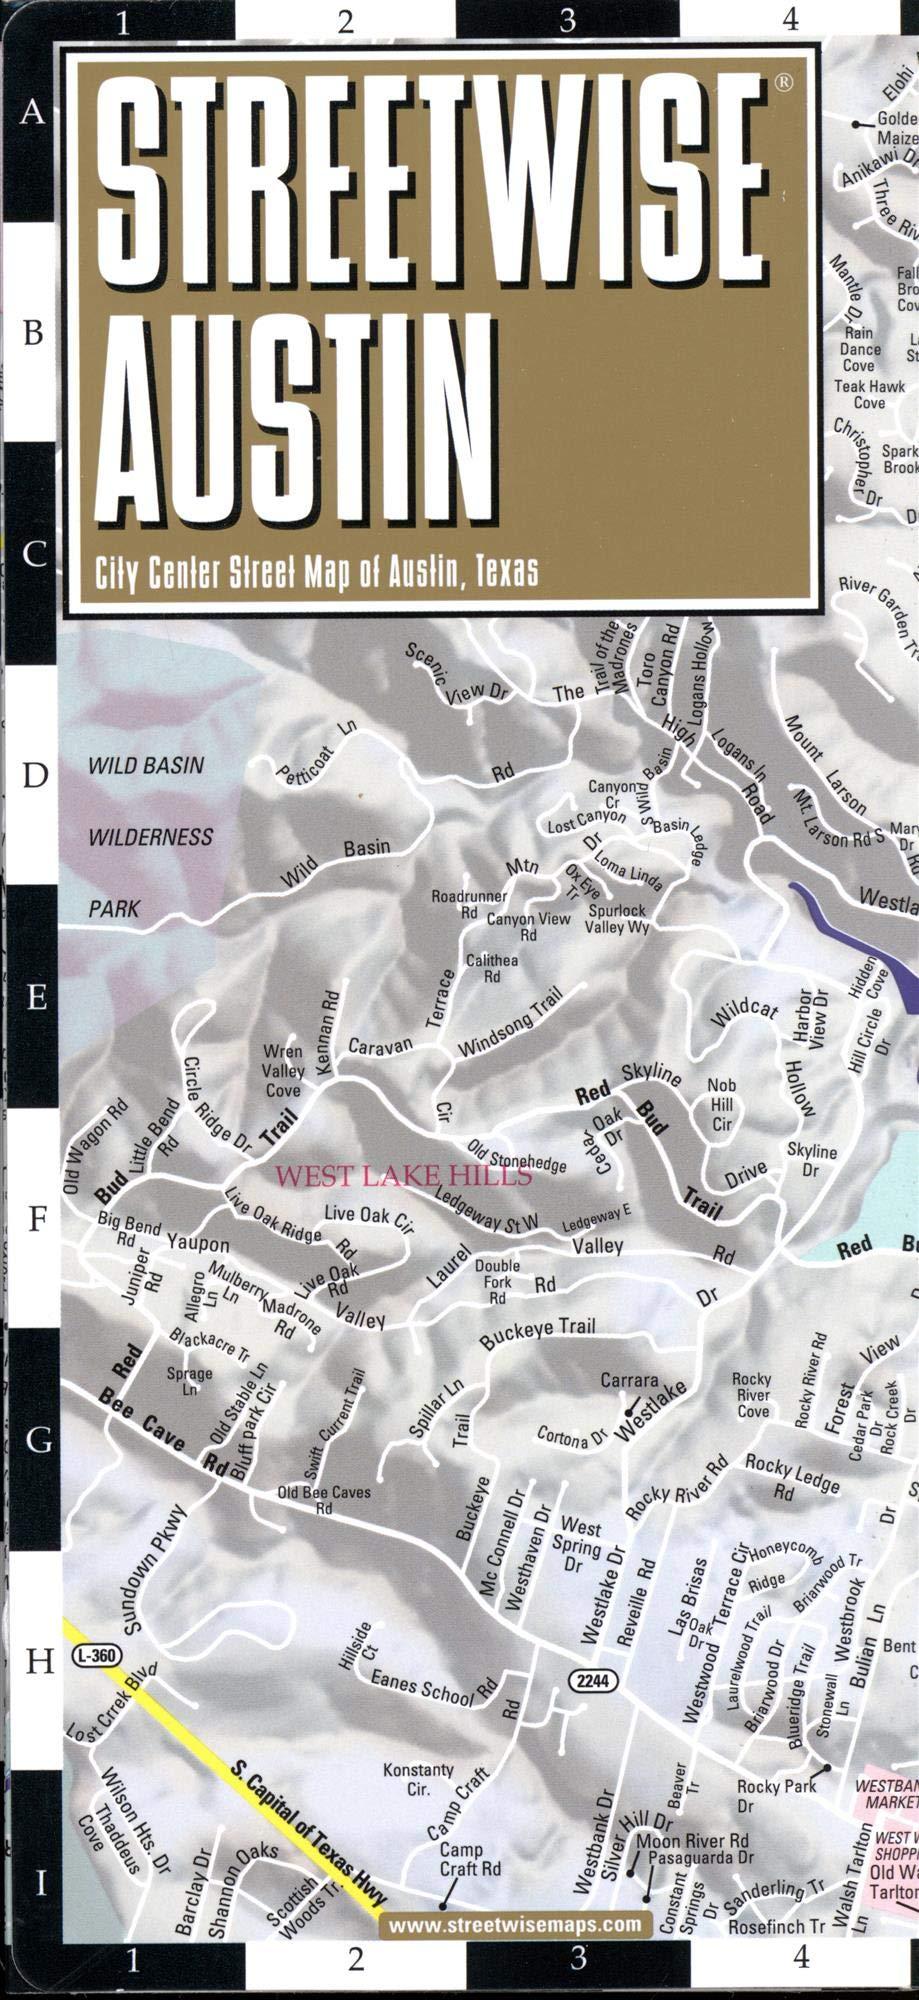 Streetwise Austin Map: Laminated City Center Map of Austin ... on city of ada ok map, city of bowling green ky map, city of santa fe nm map, city of harahan la map, city of los angeles ca map, city of stuart fl map, city of concord nc map, city of grand forks nd map, city of long beach ca map, city of manchester nh map, city of bismarck nd map, city of green bay wi map, city of caldwell id map, city of apache junction az map, city of ann arbor mi map, city of darien ct map, city of battle creek mi map, city of dubois pa map, city street maps austin texas, city of sault ste marie mi map,